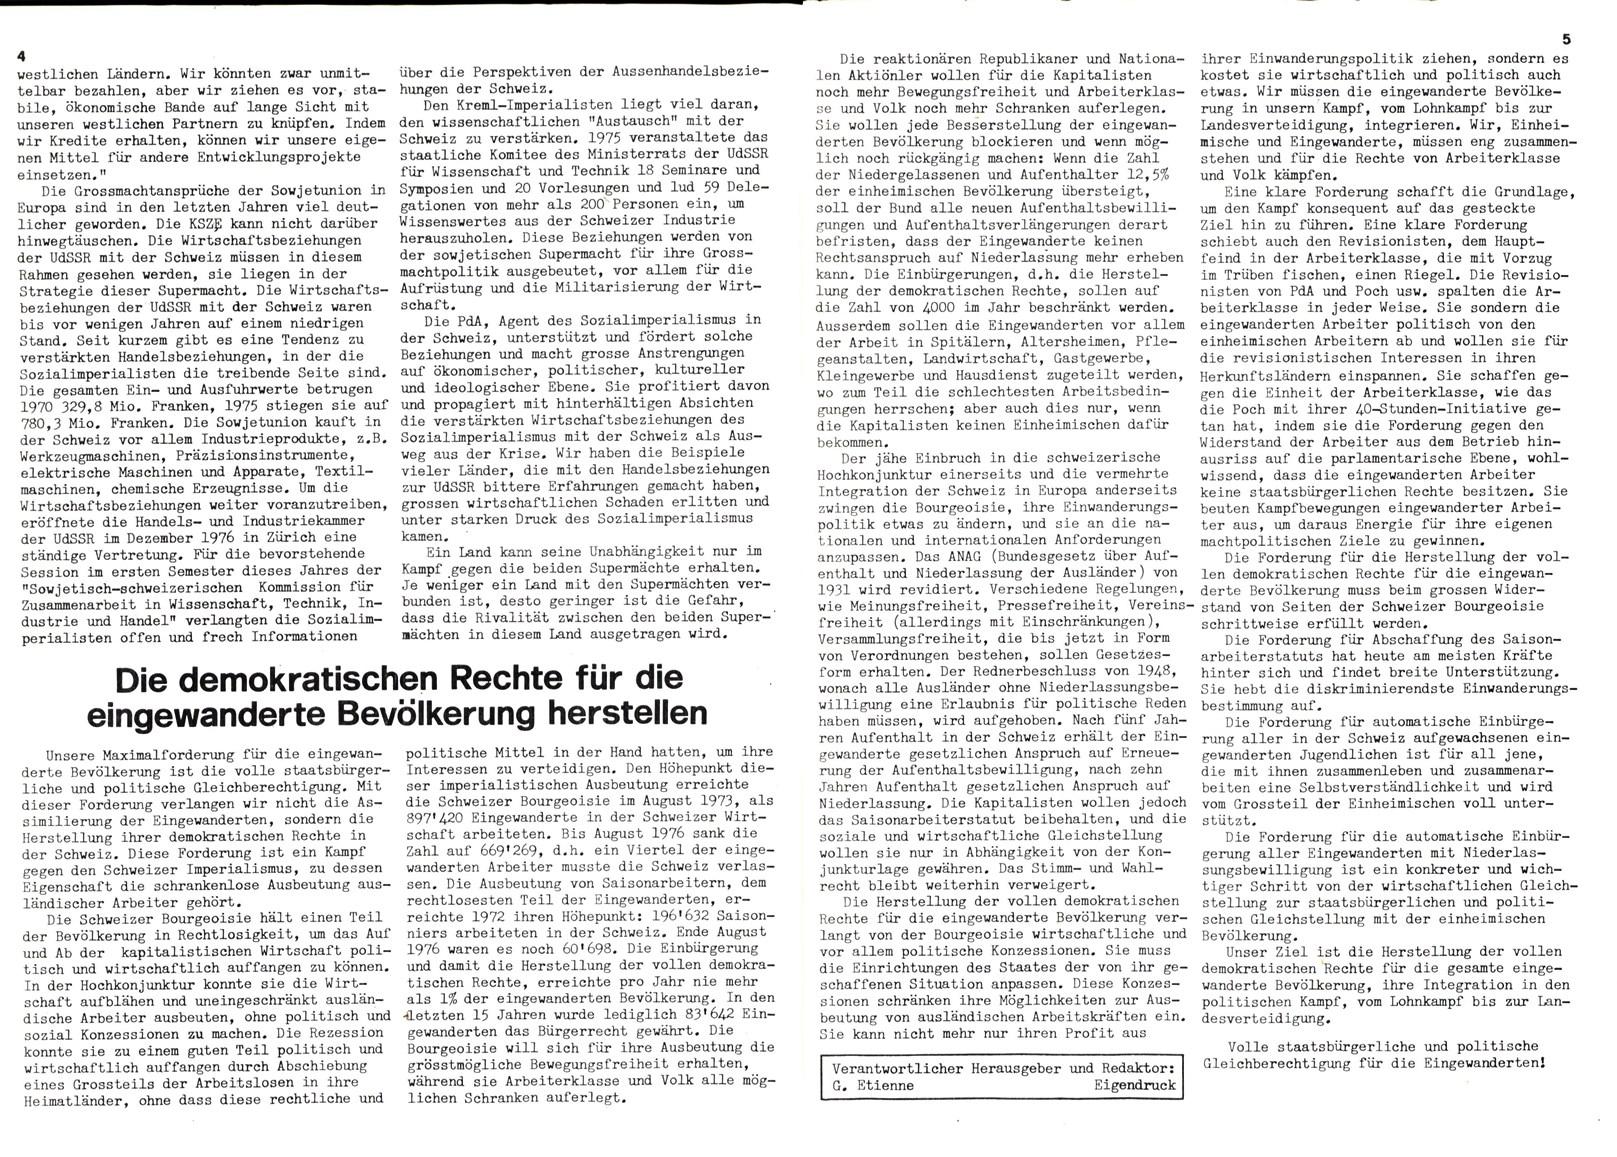 Schweiz_KPSML_Oktober_19770300_108_003